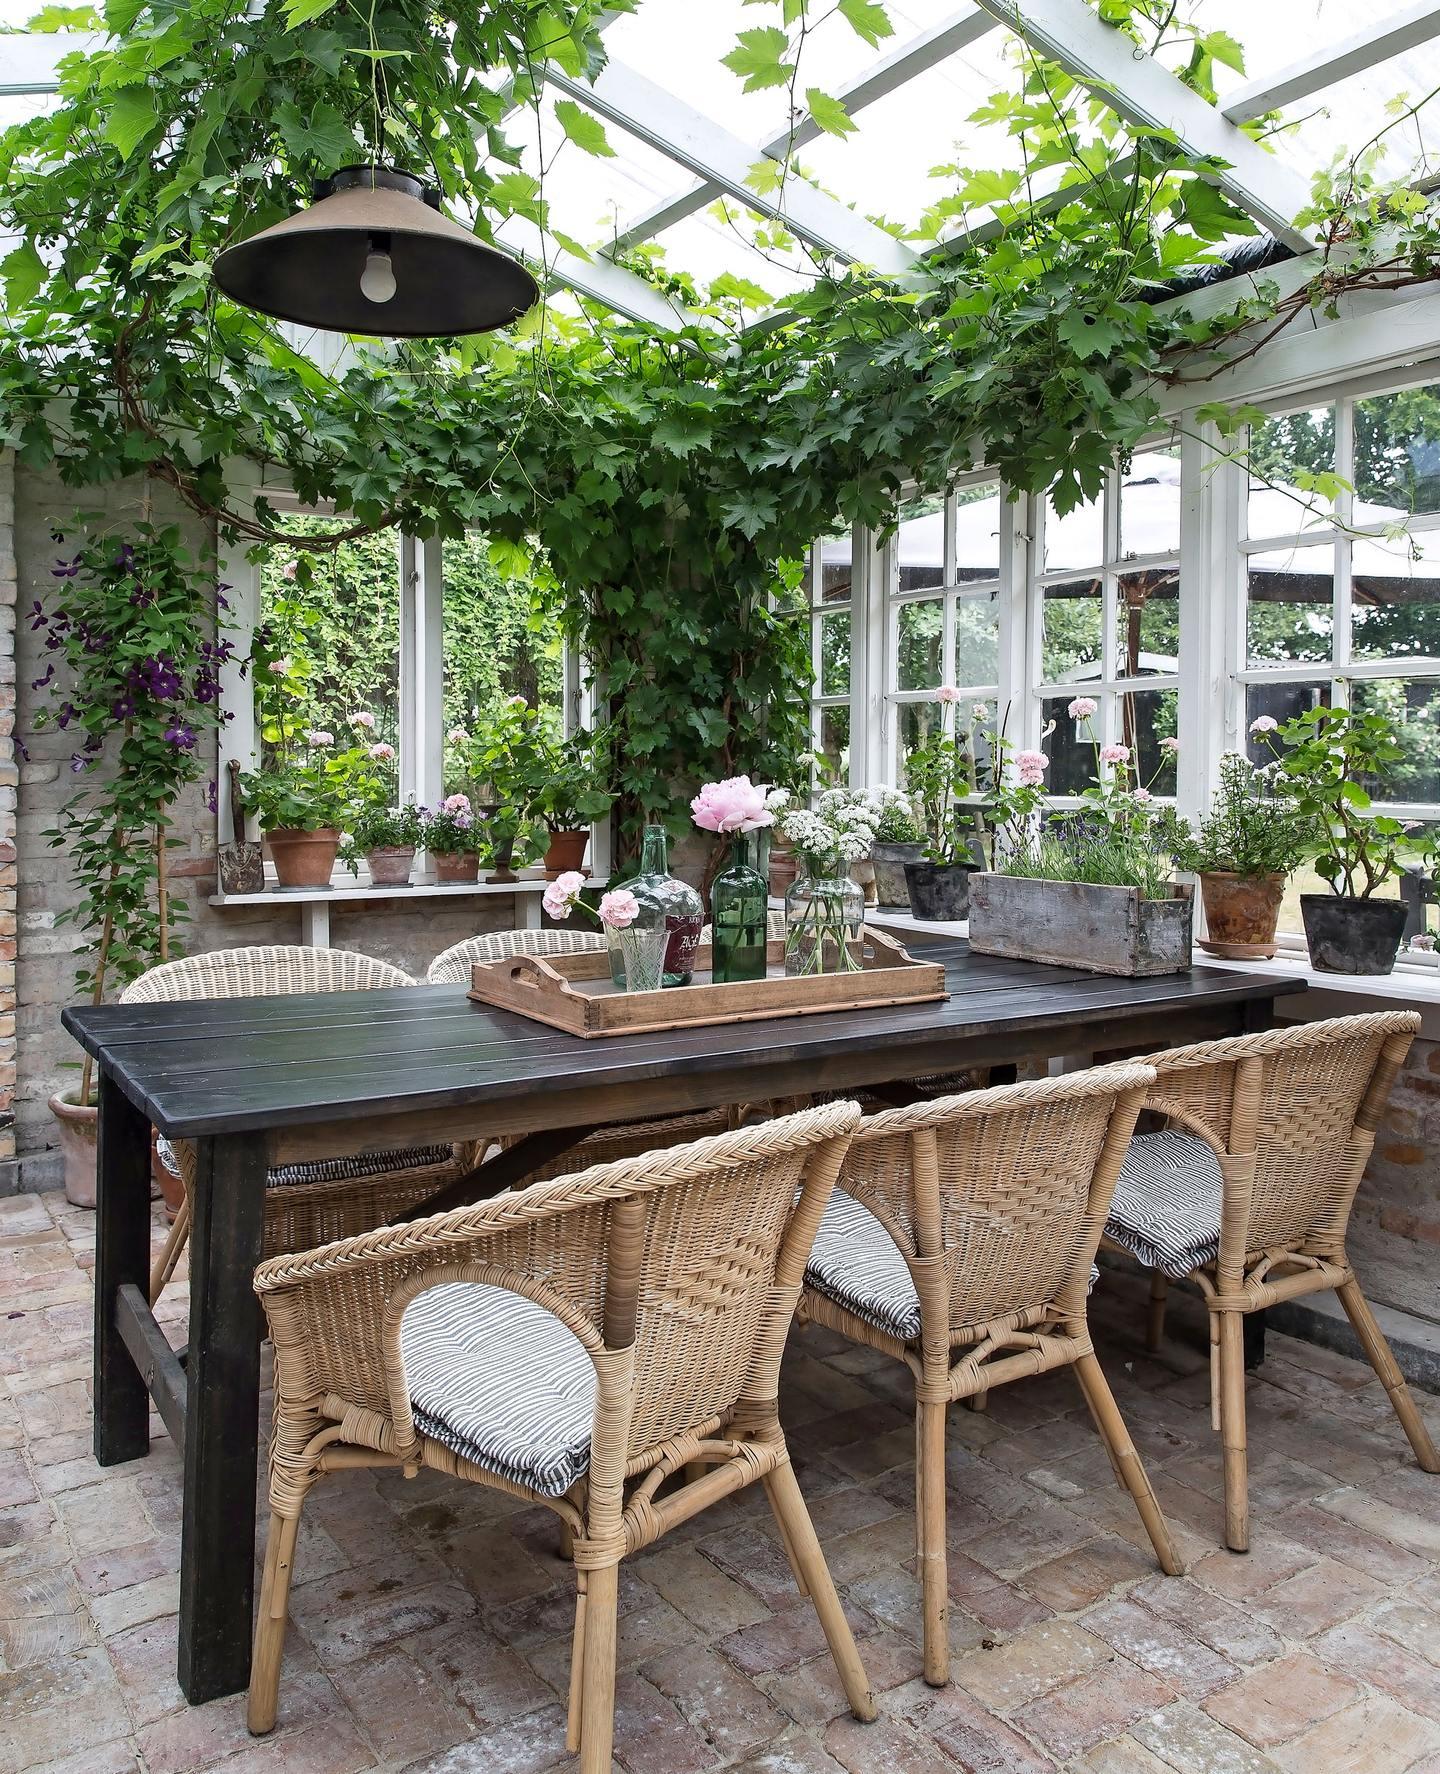 Giardino D Inverno In Vetro giardino d'inverno in stile vintage | shabby chic mania by